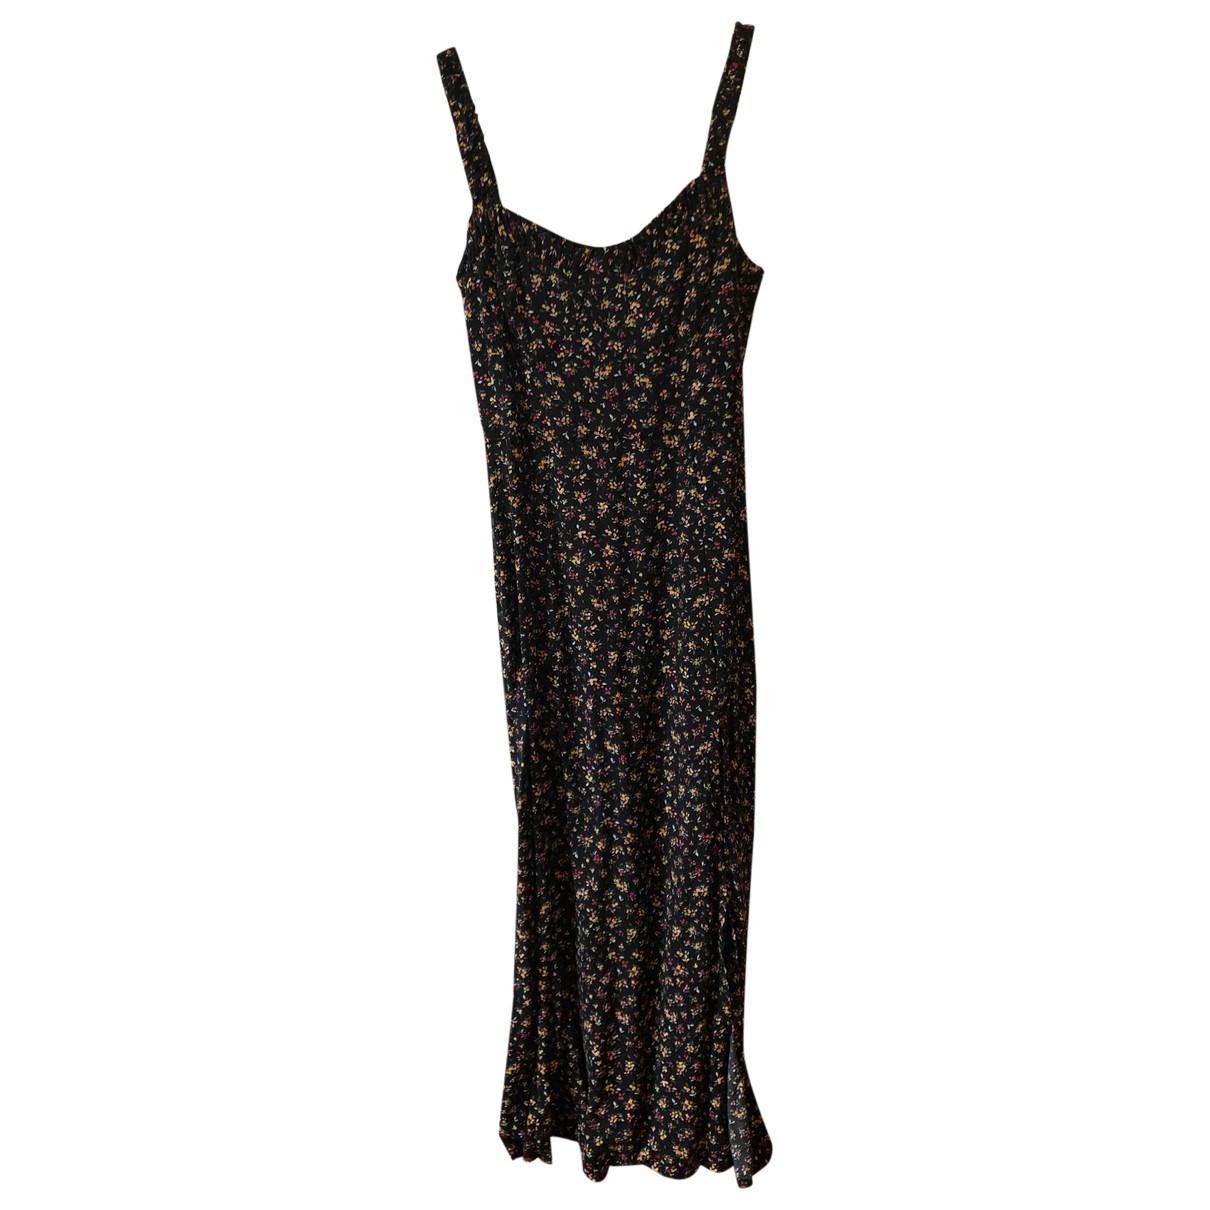 Zara \N Navy Cotton dress for Women XS International